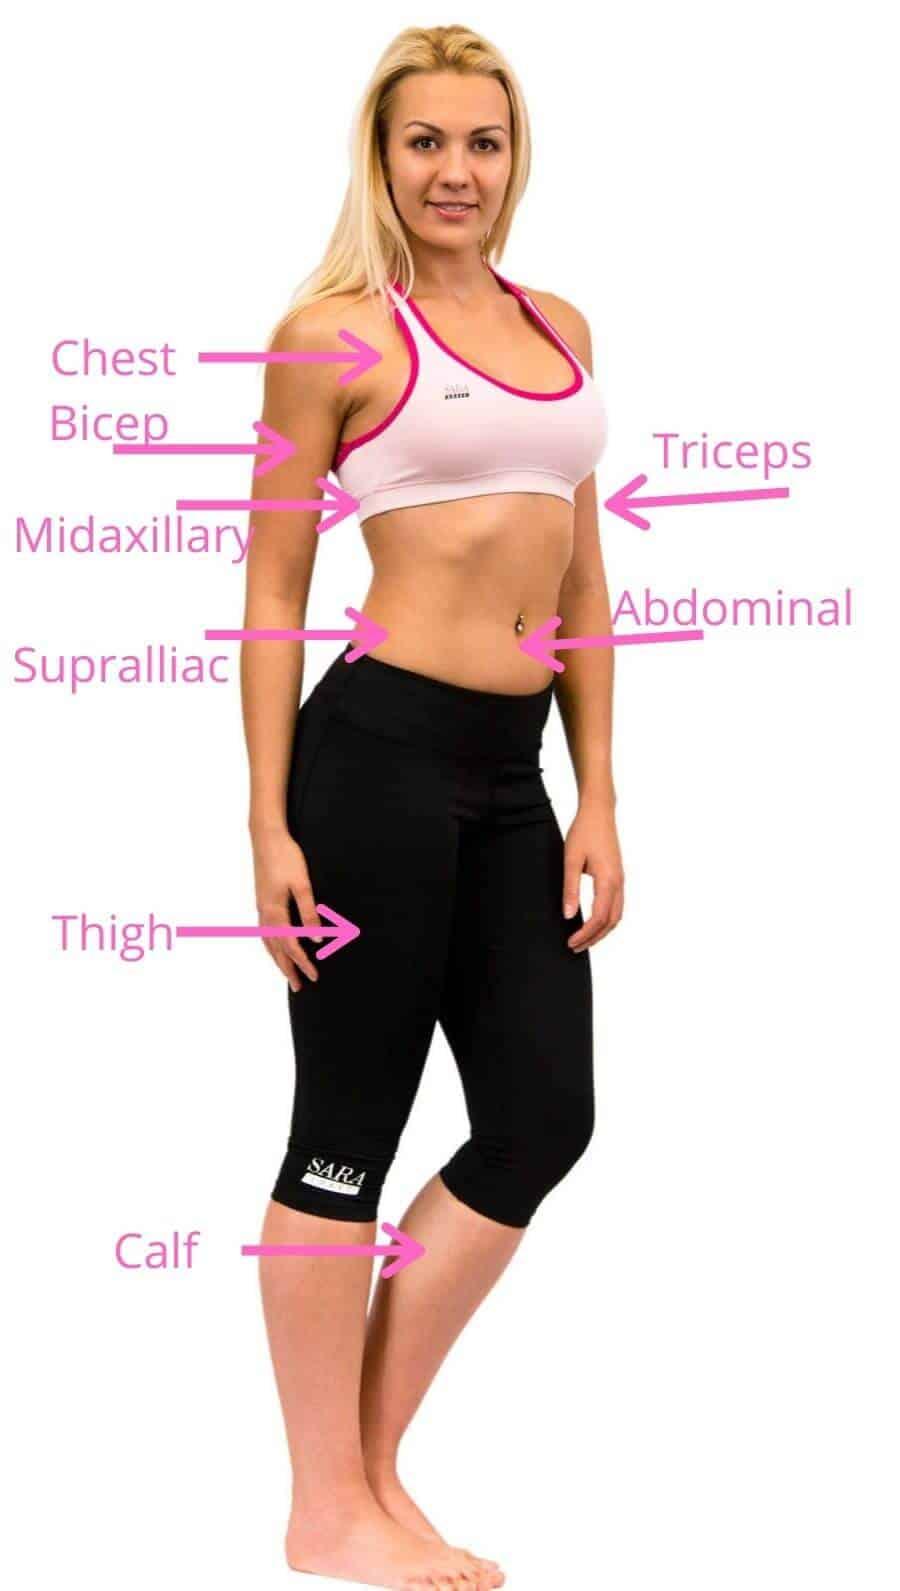 body fat measurement locations chart